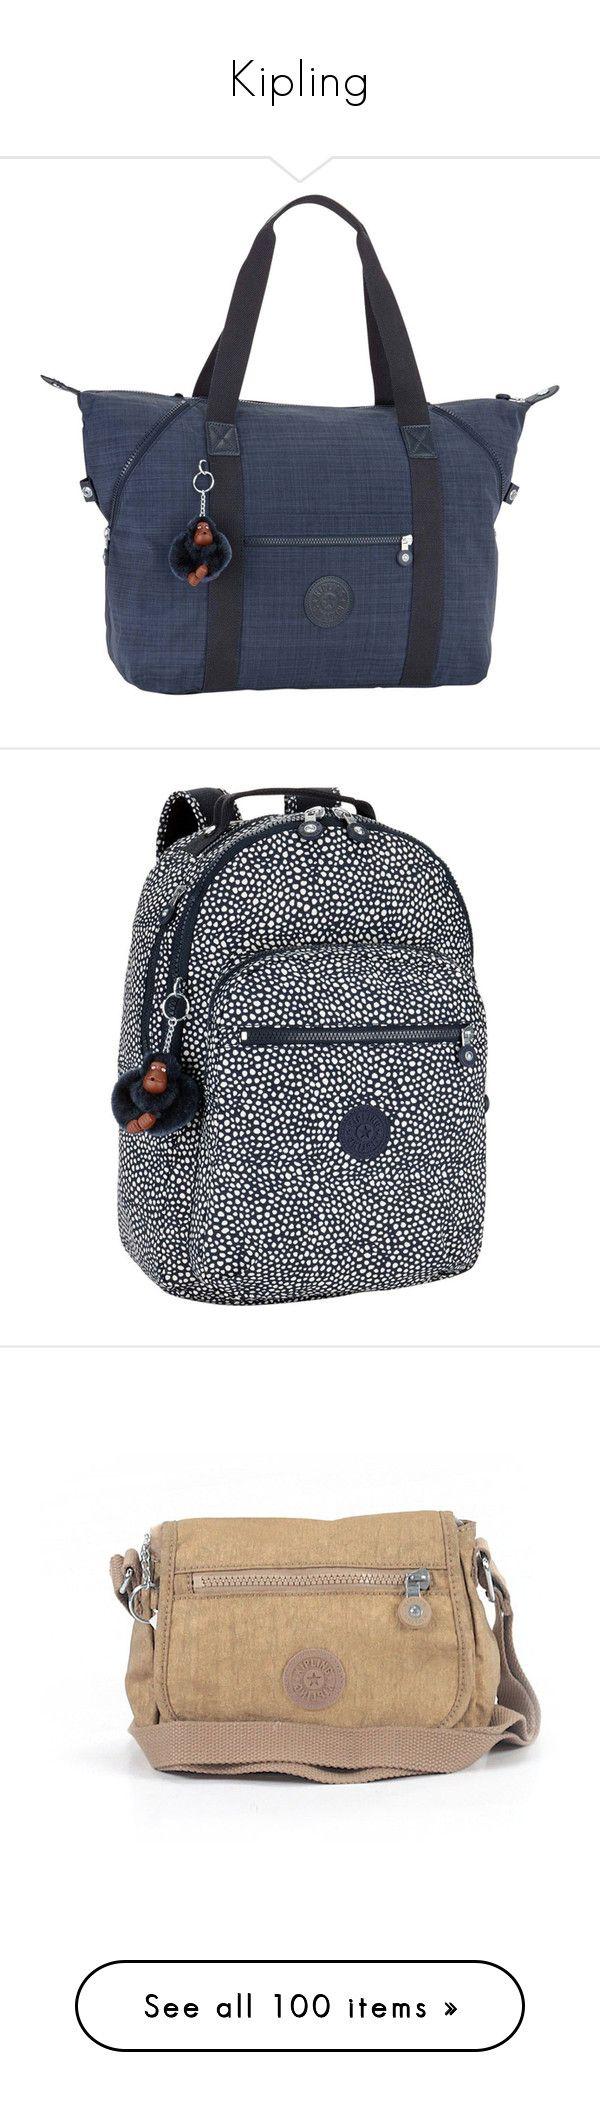 """Kipling"" by angelbrubisc ❤ liked on Polyvore featuring bags, luggage, backpacks, nylon rucksack, backpack laptop bag, laptop bag, lightweight backpack, day pack backpack, handbags and shoulder bags"